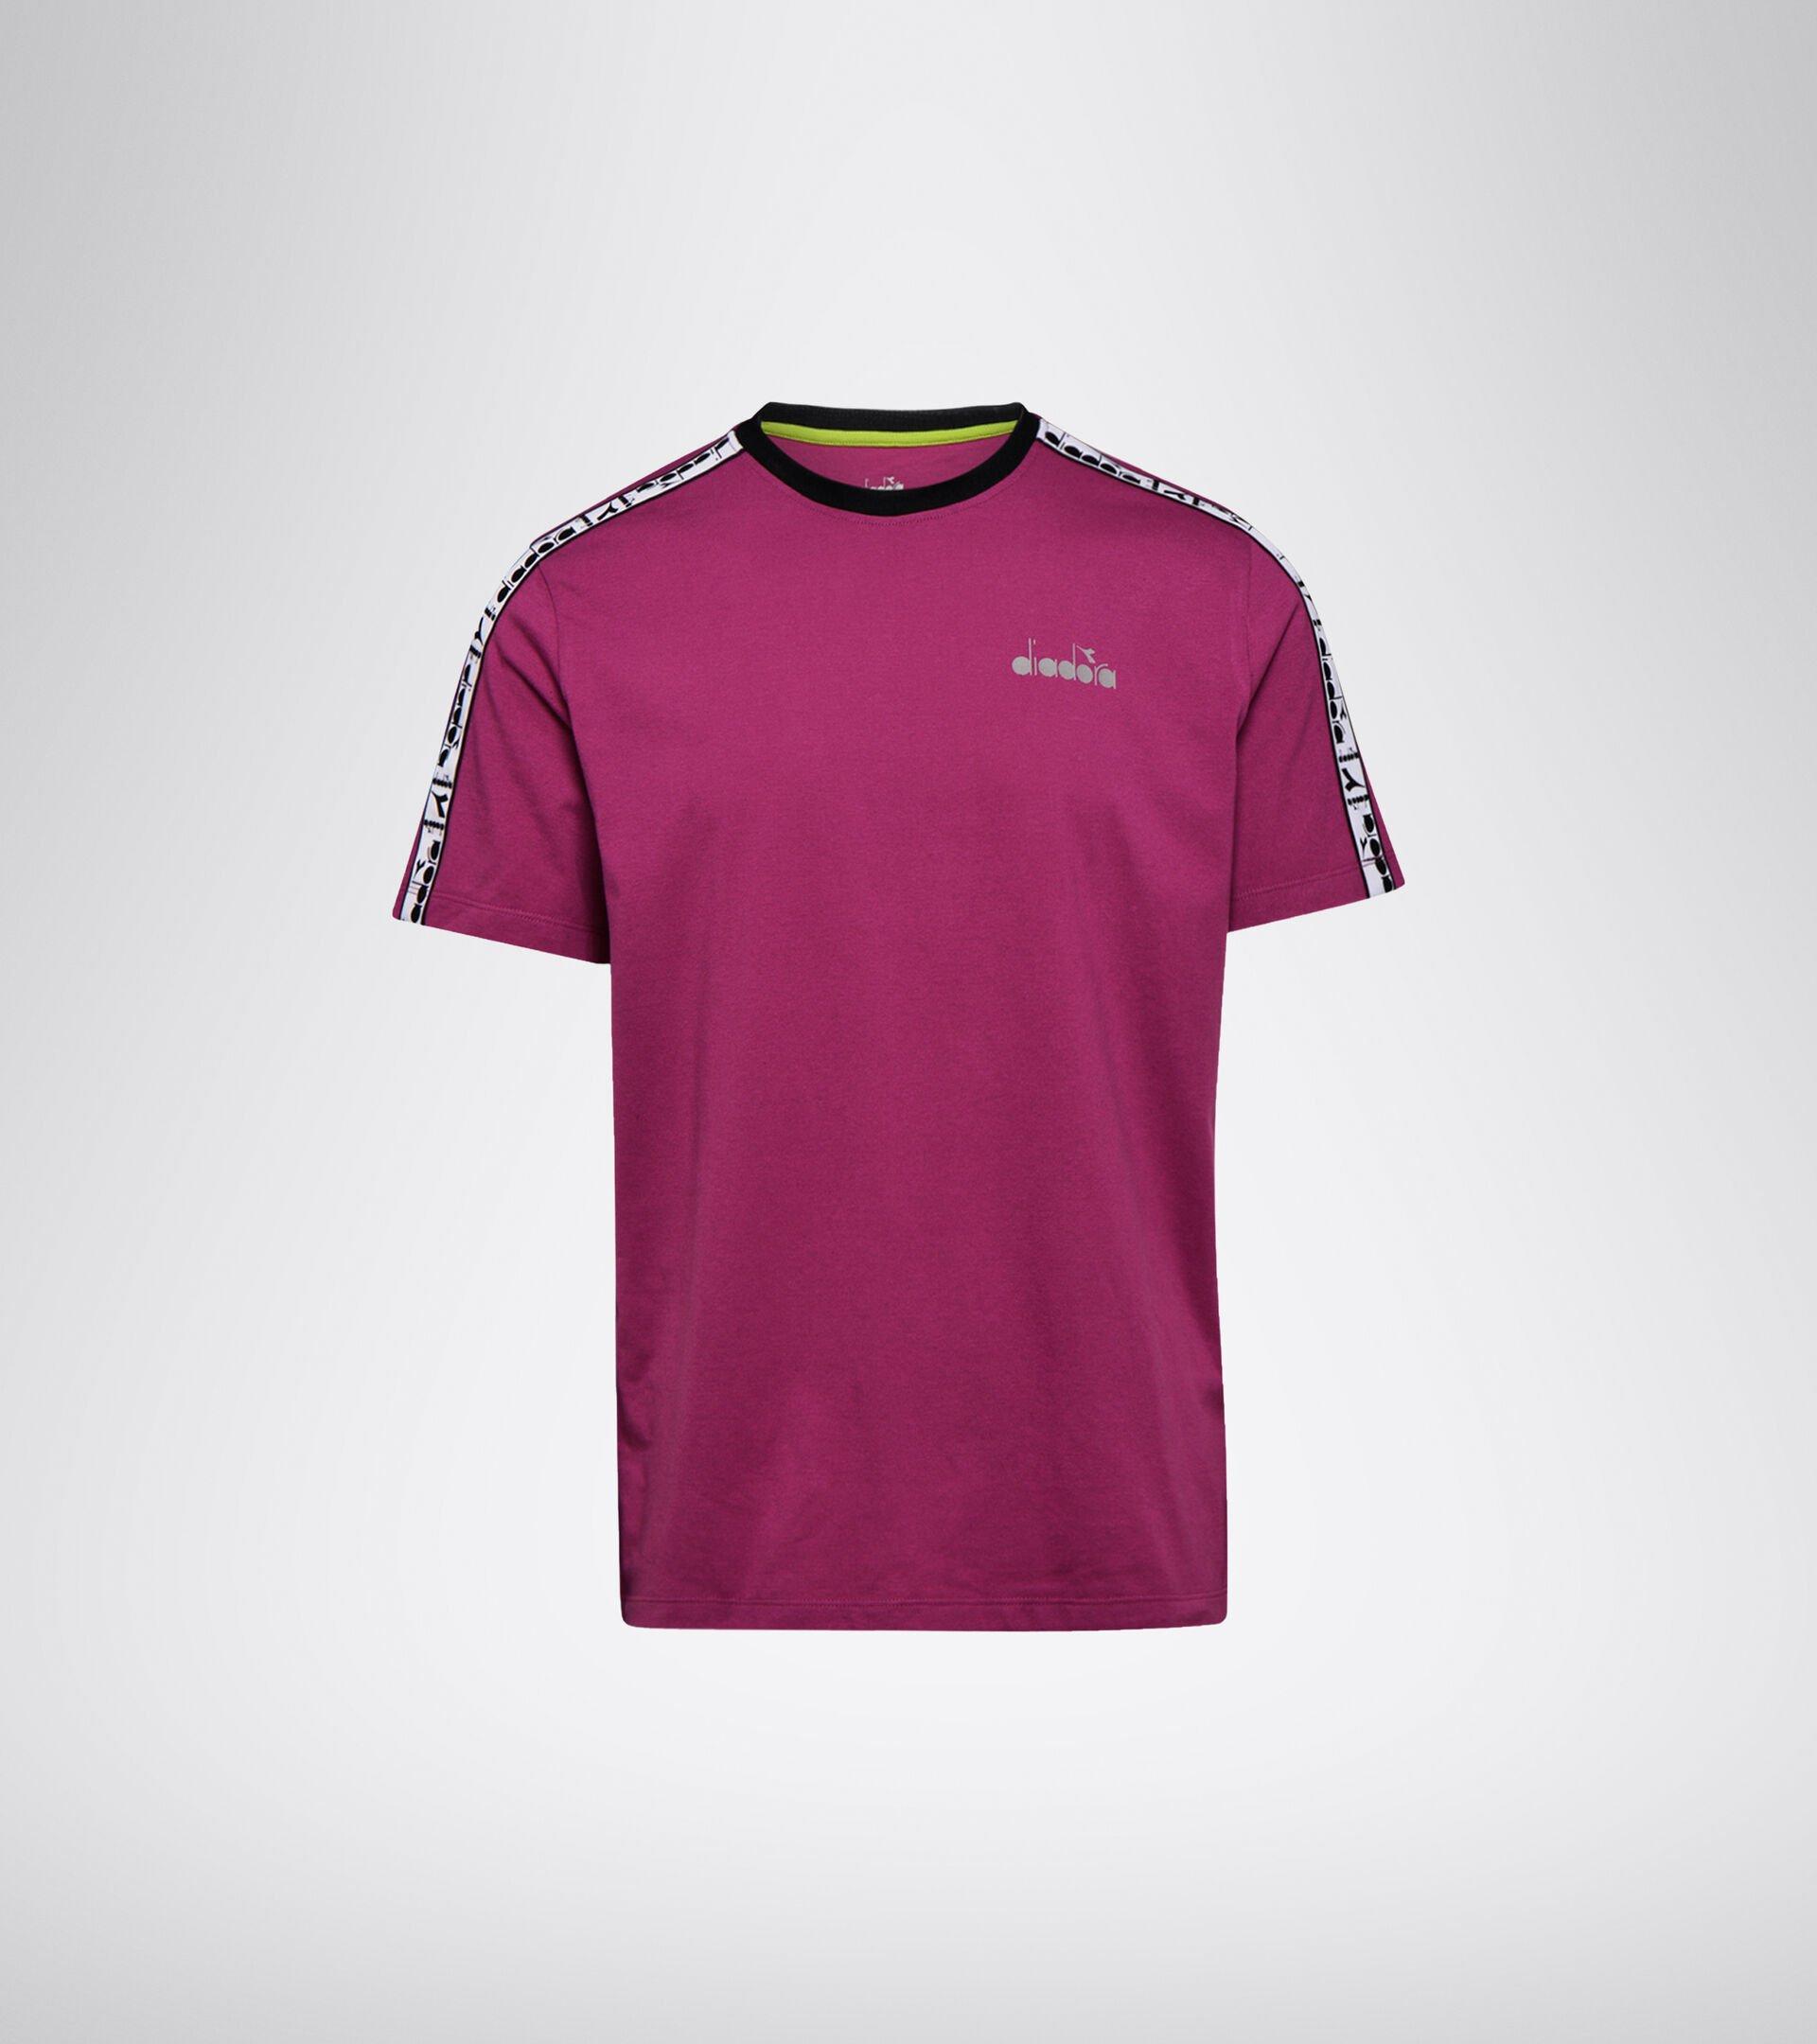 Camisetas deportivas - Hombre SS T-SHIRT PLUS BE ONE BATON ROUGE - Diadora